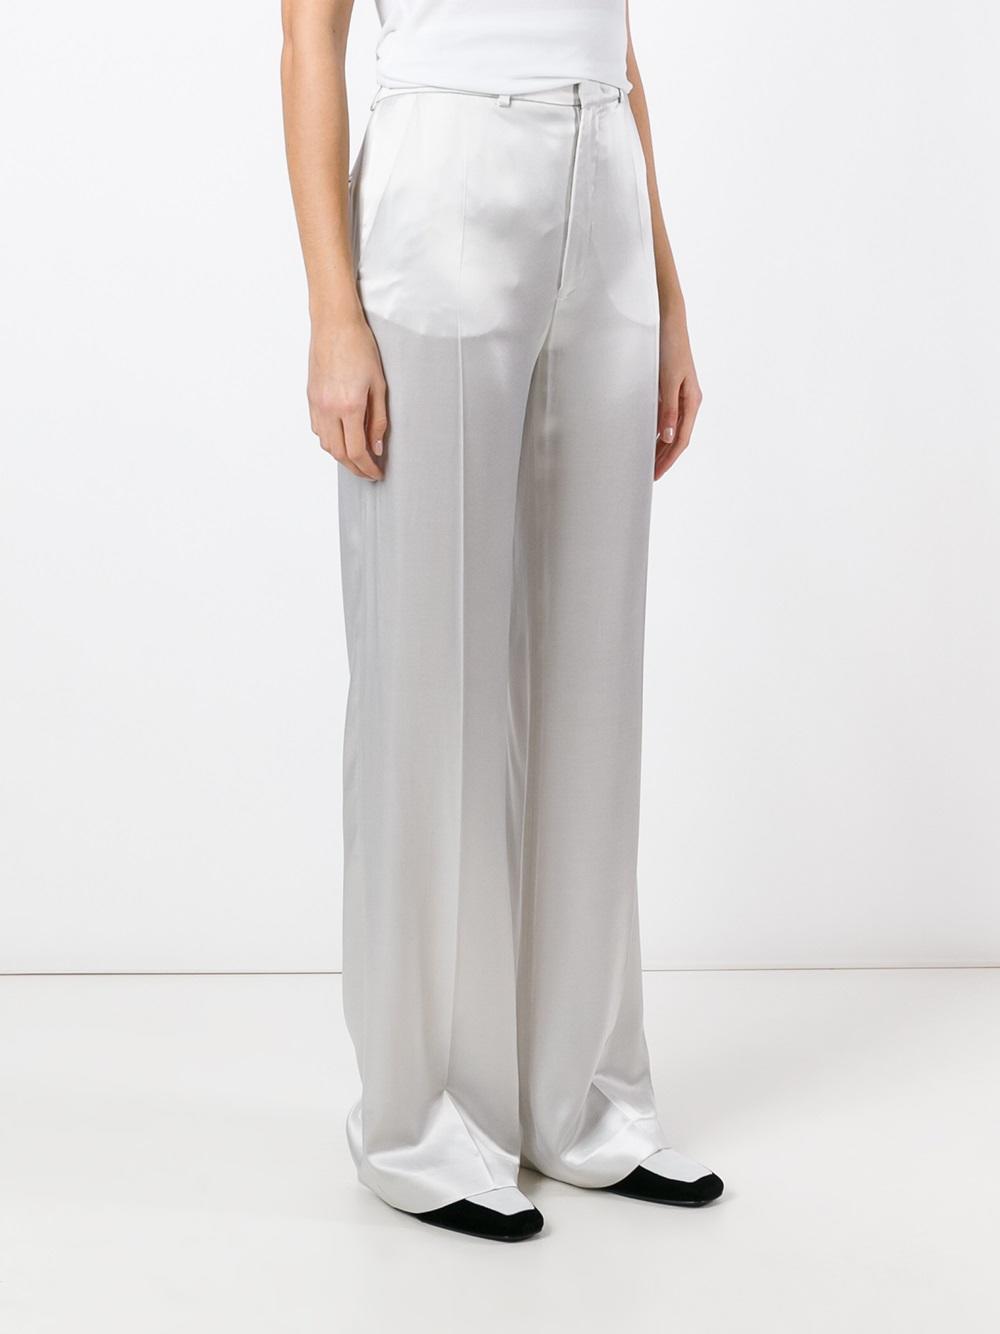 tailored trousers - Metallic Joseph tiAhcTf2Fe